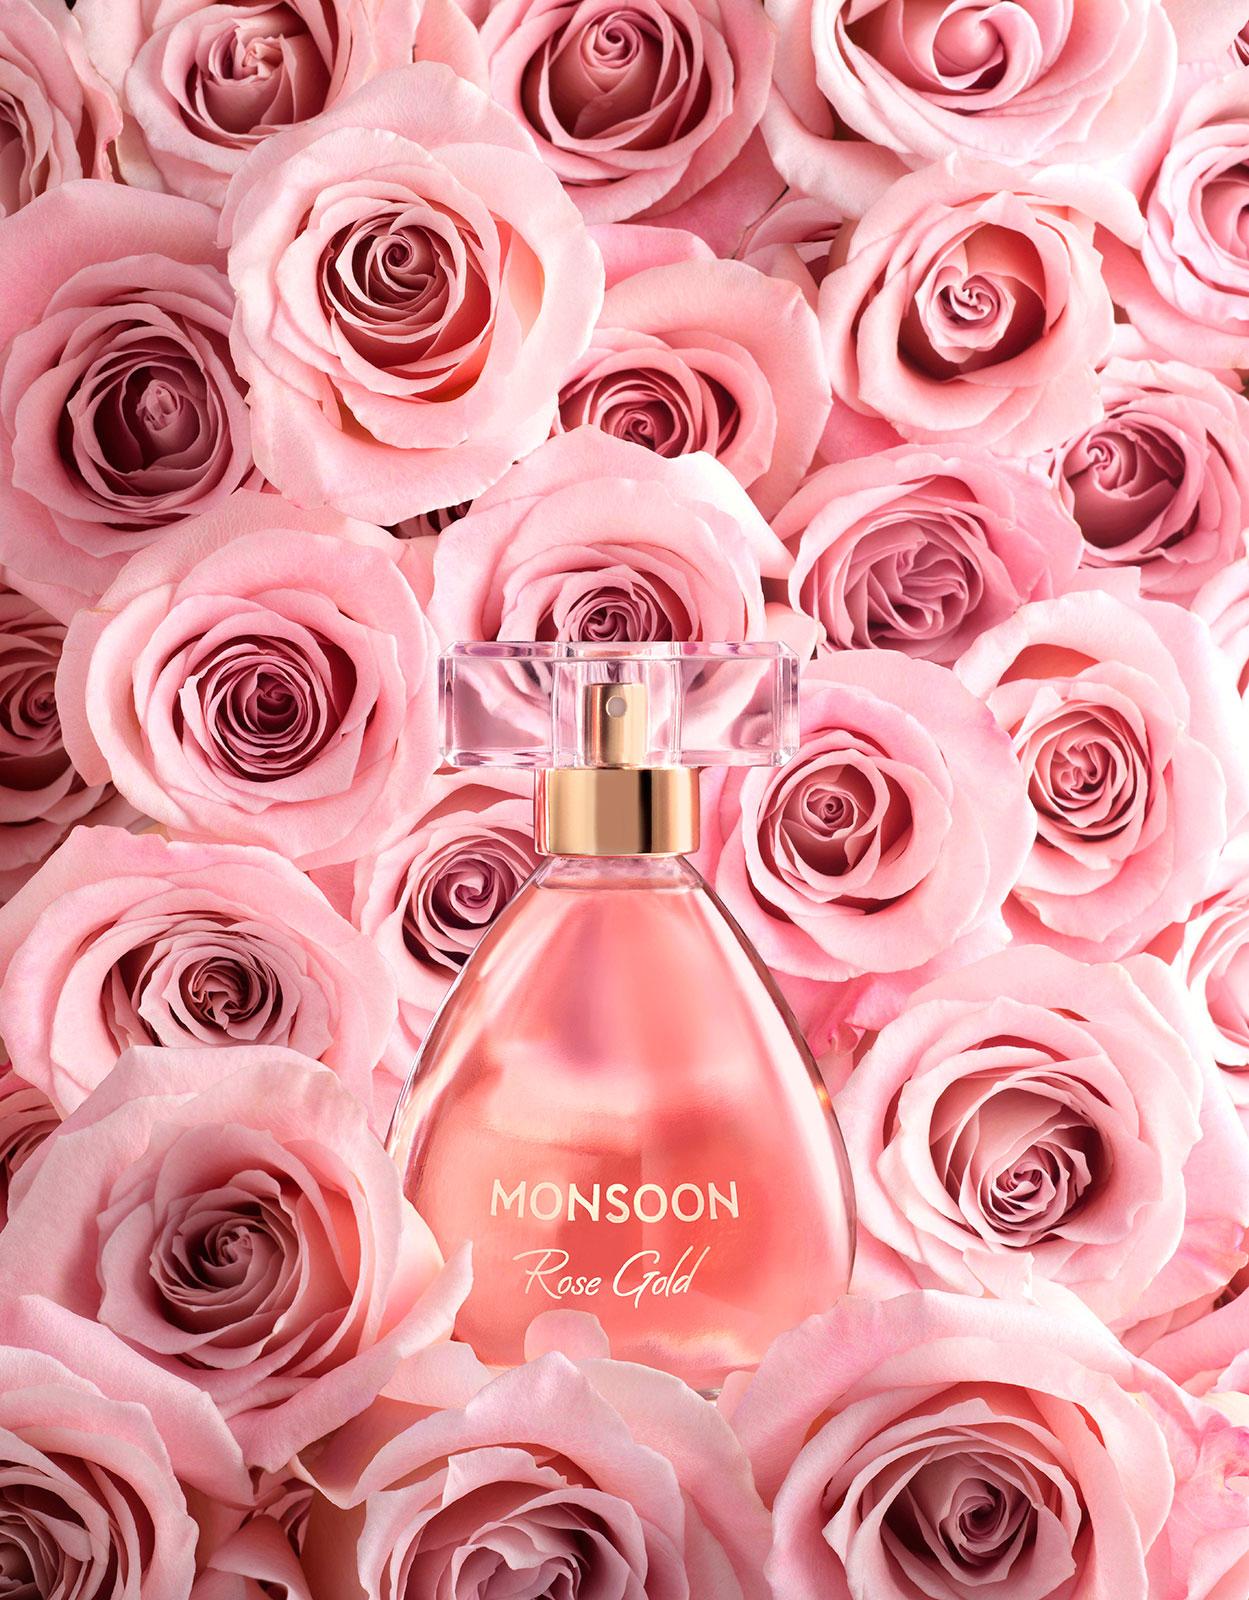 Rose Gold Monsoon Perfume A New Fragrance For Women 2015